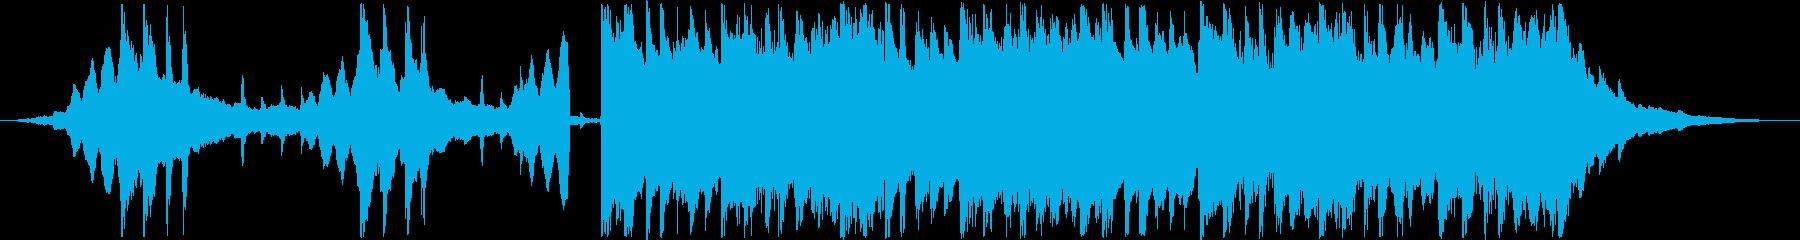 CM用30秒、次世代、スタイリッシュ製品の再生済みの波形